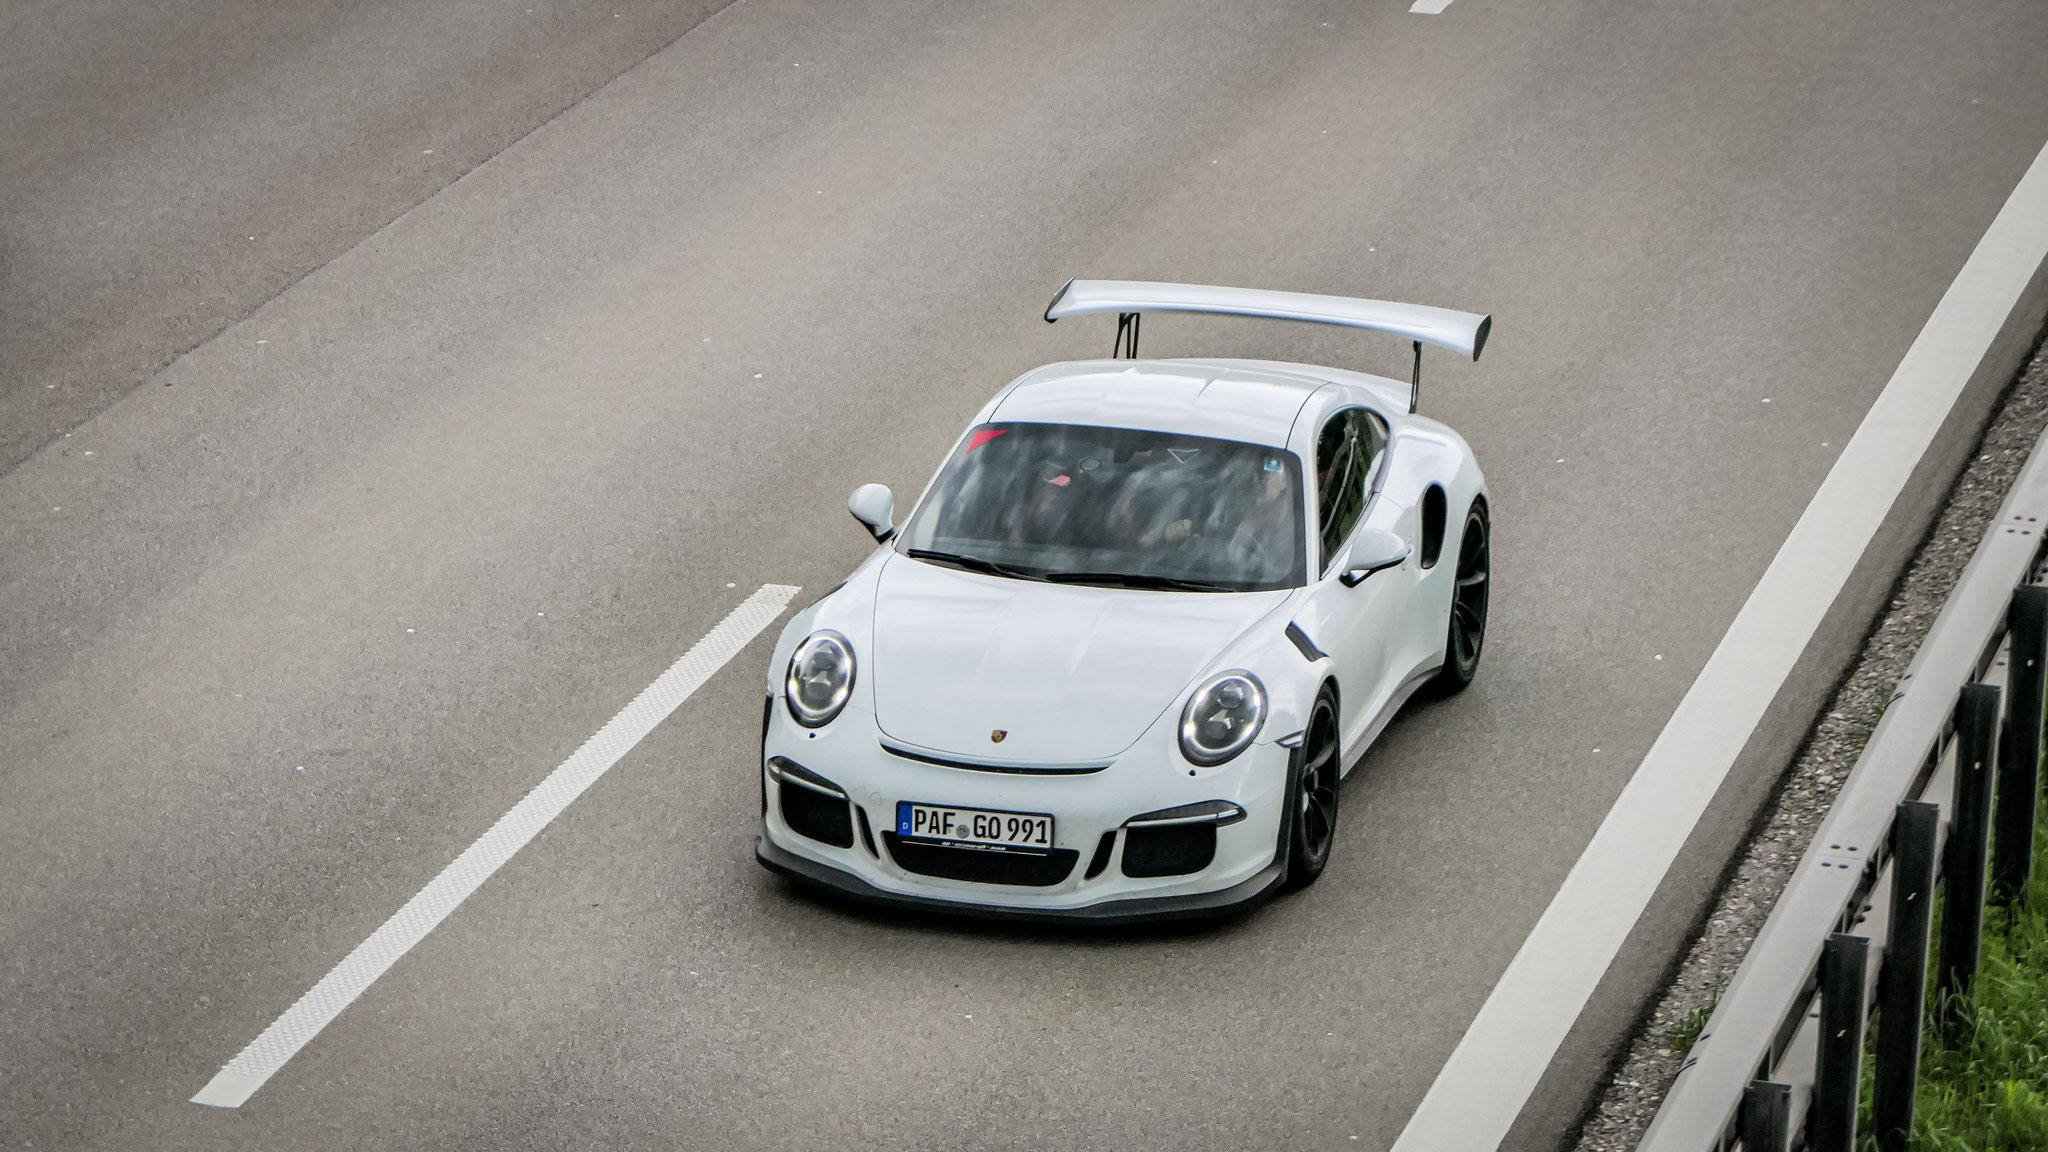 Porsche 911 GT3 RS - PAF-GO-991